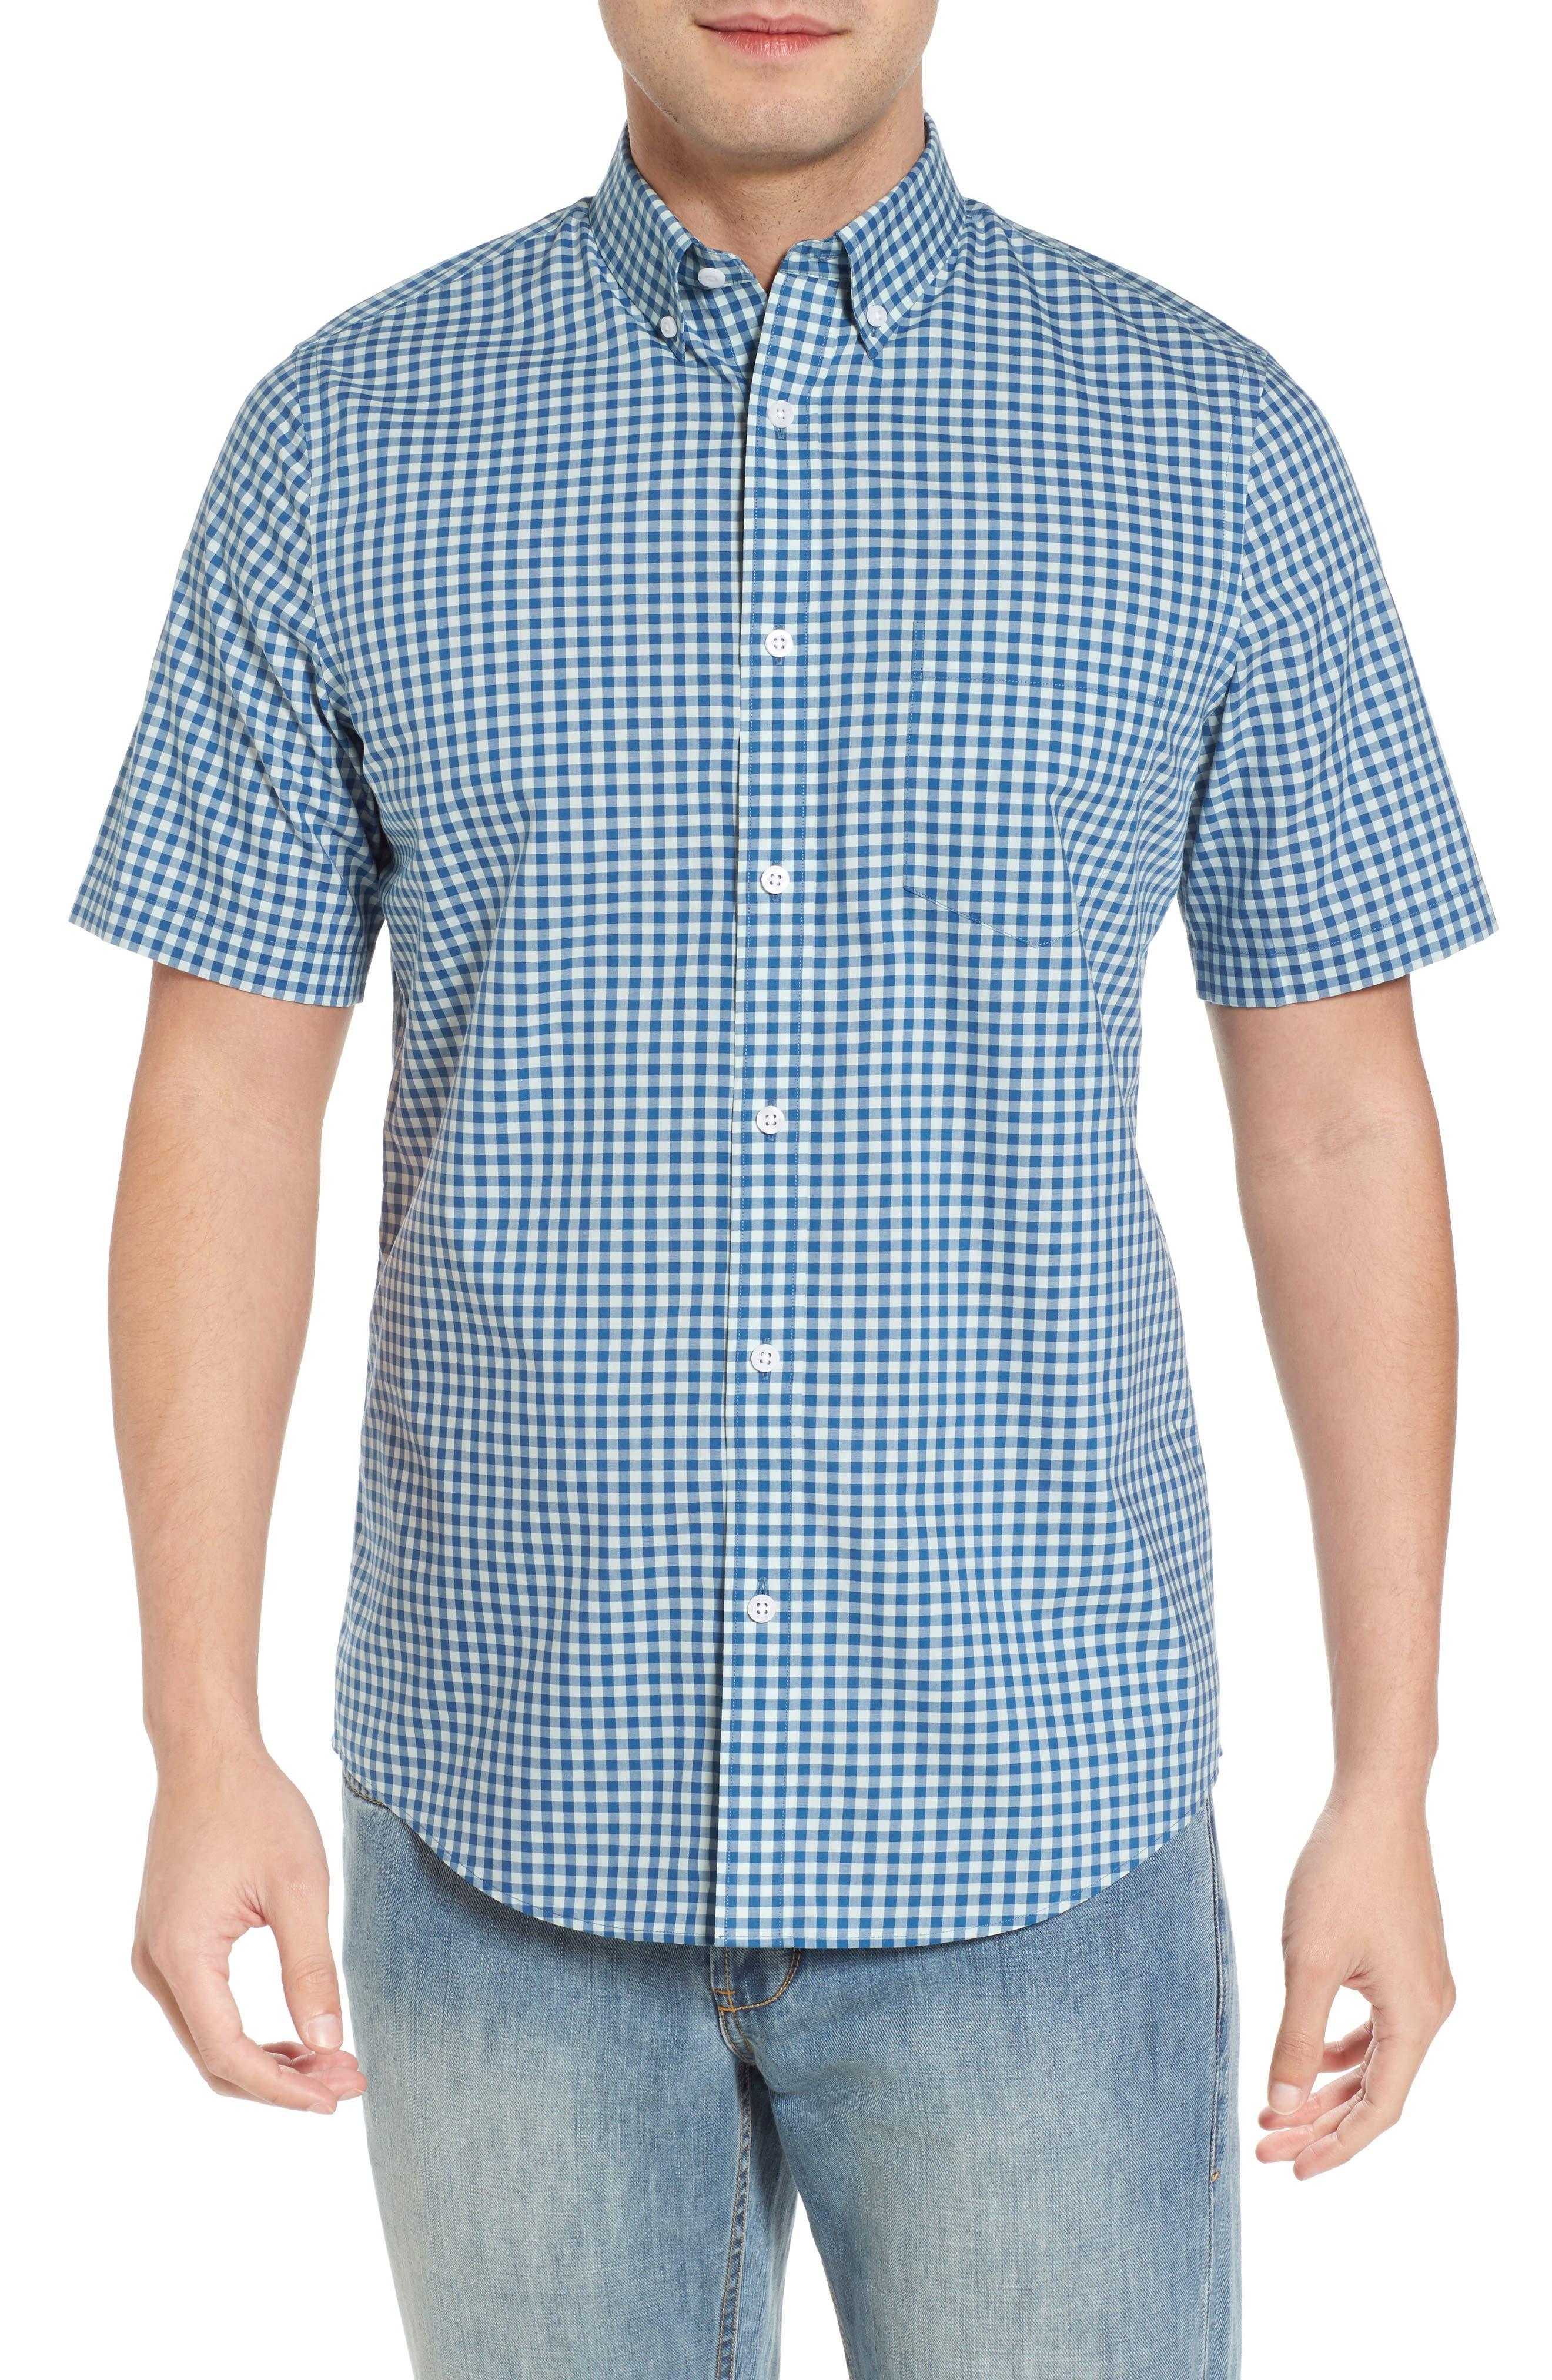 Regular Fit Gingham Sport Shirt,                             Main thumbnail 1, color,                             440